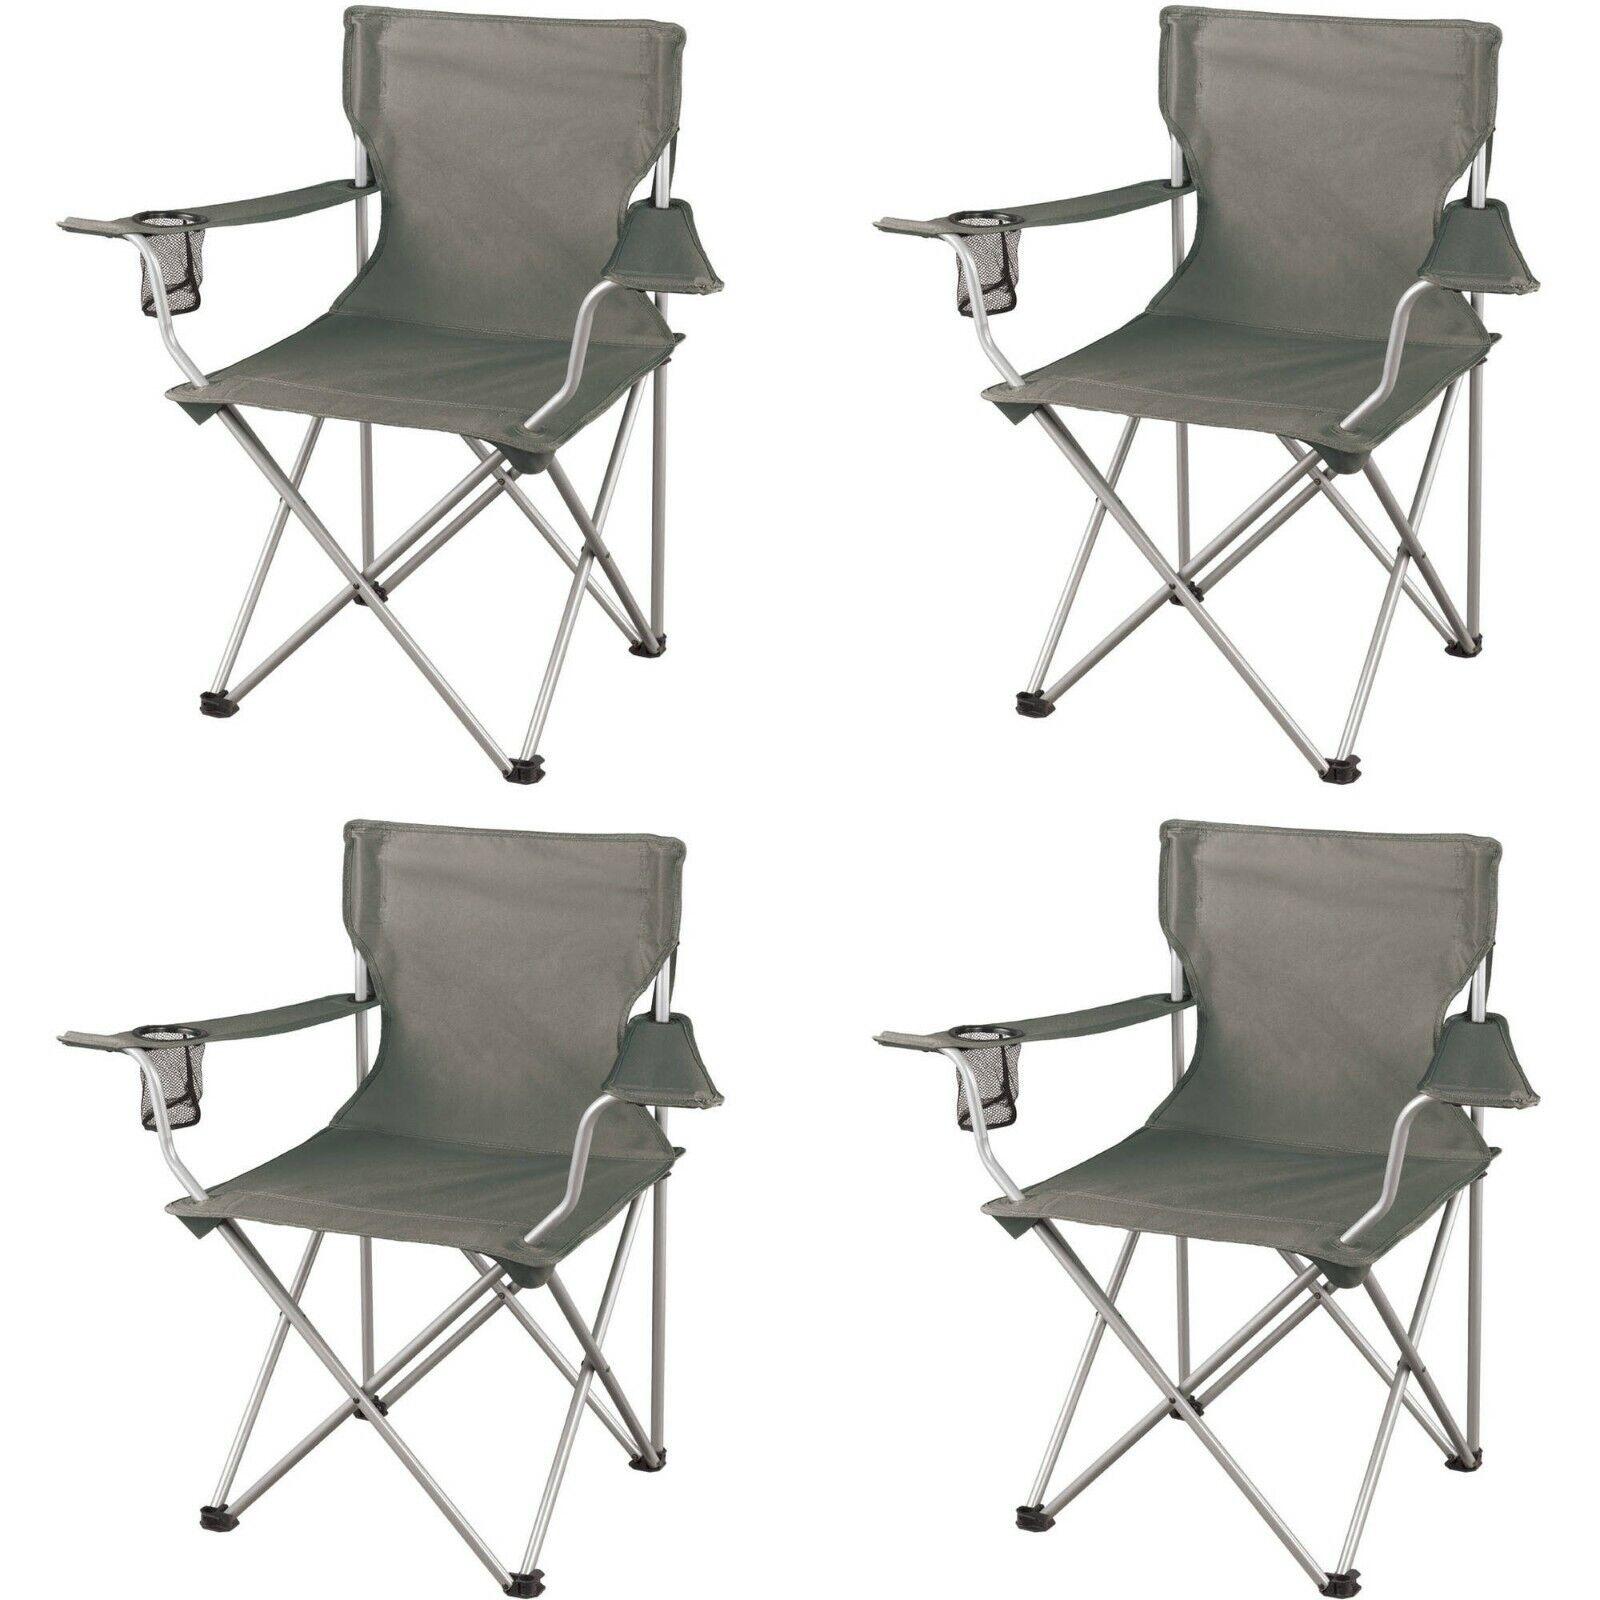 4 pack Folding Camping Stool Ultralight  Outdoor Slacker Chair for Backpack